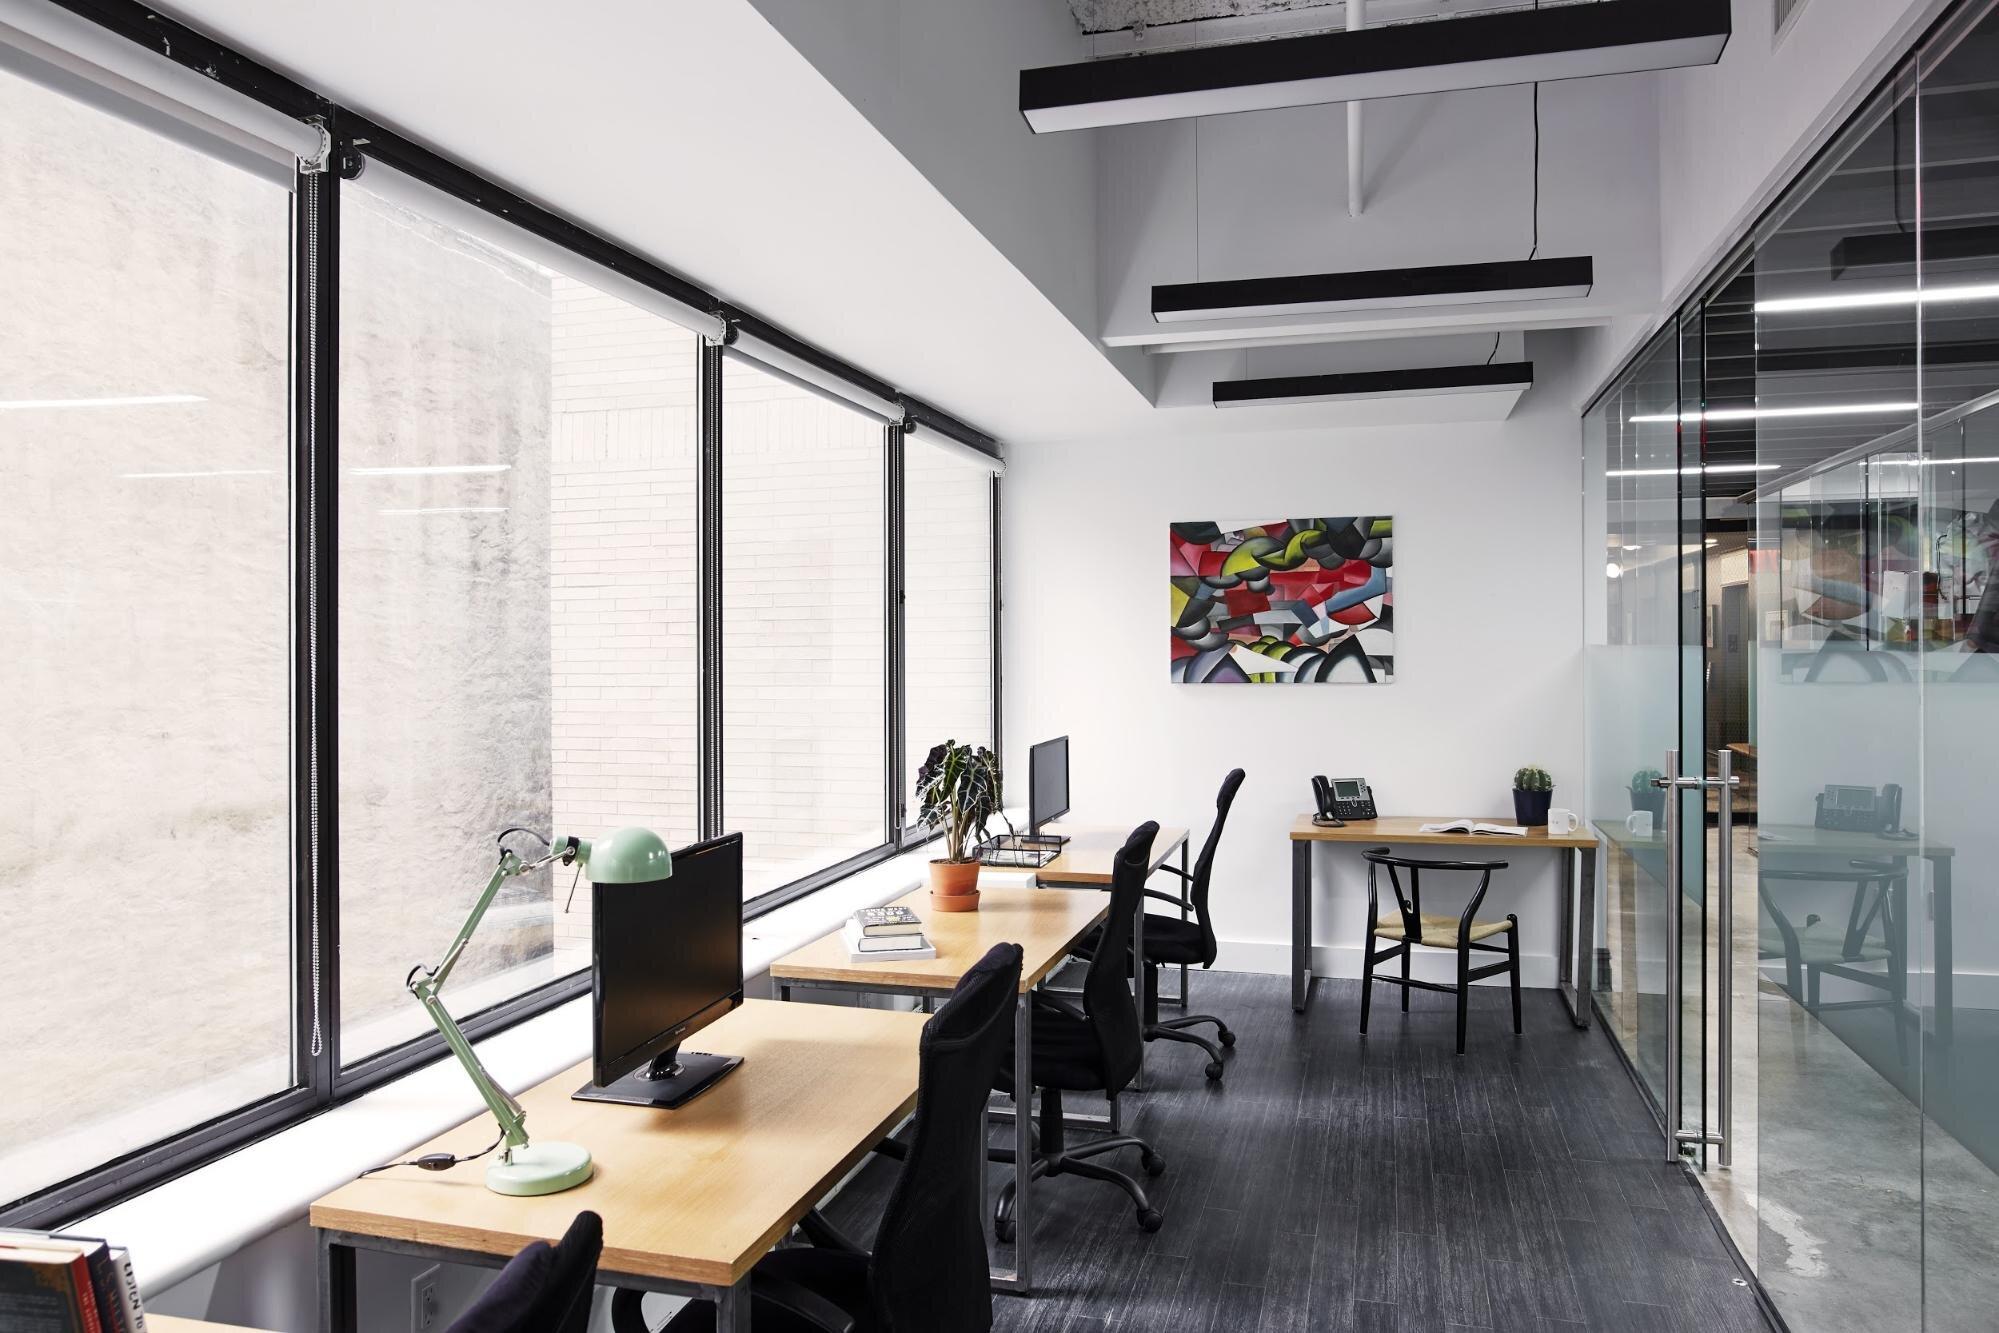 Desks facing windows in a shared work space